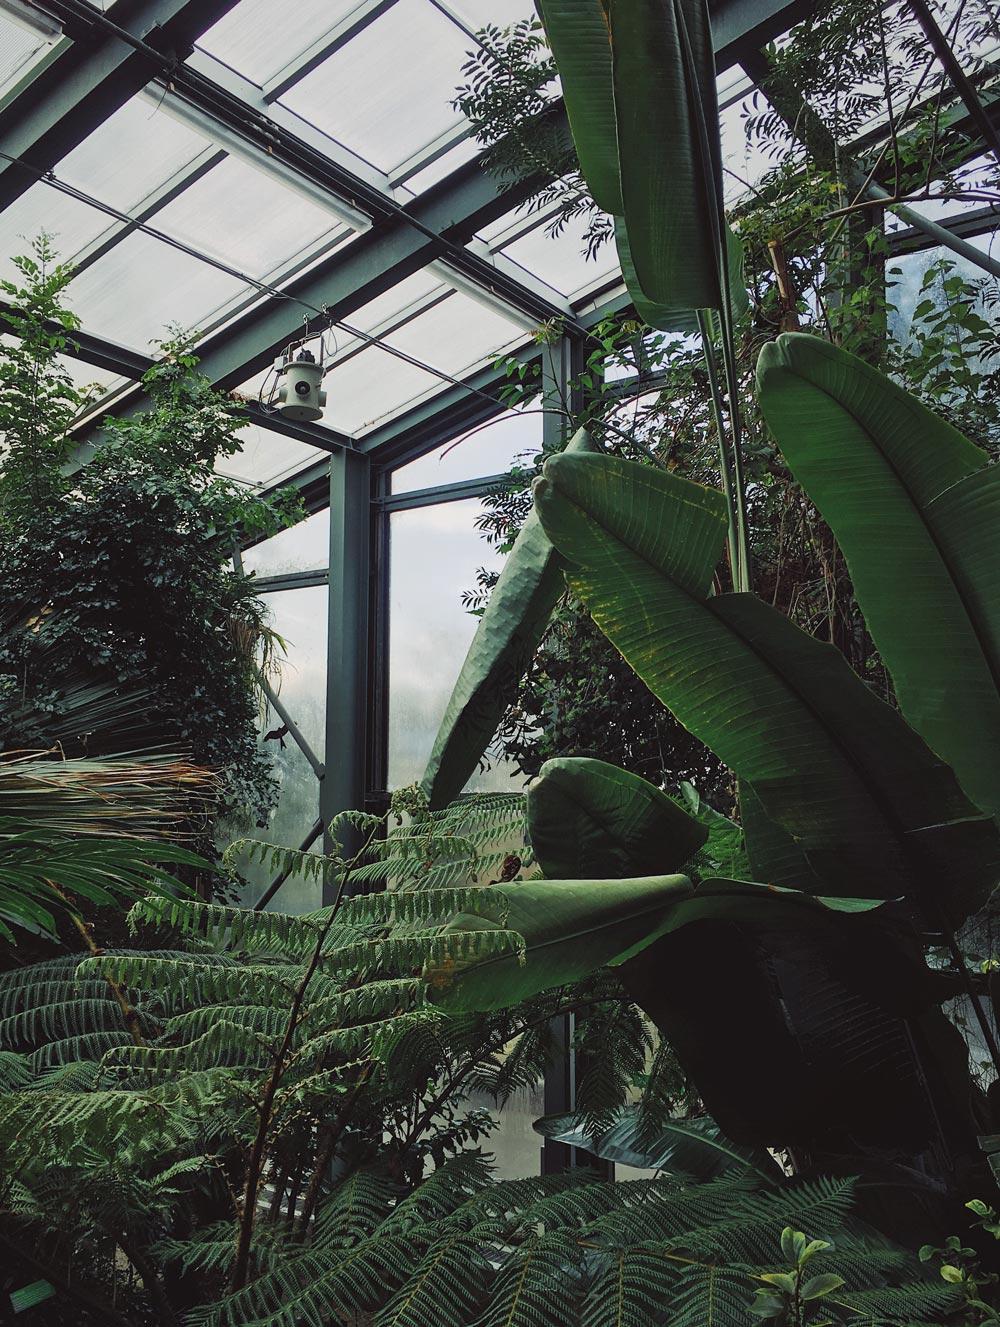 Botanic-garden2_opt.jpg